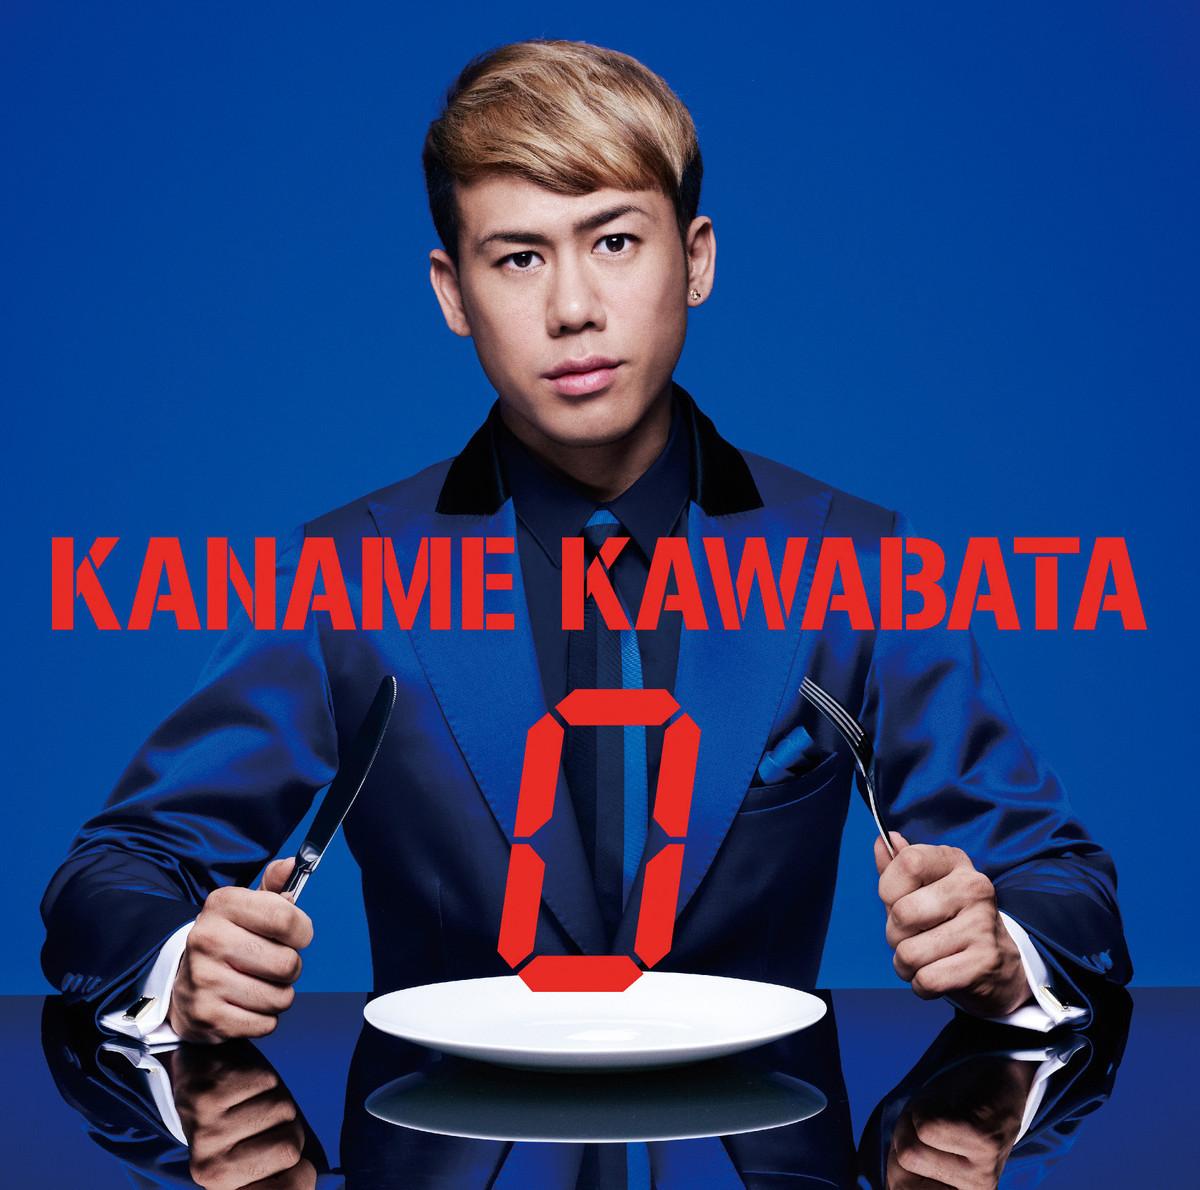 20190112.0627.15 Kaname Kawabata - 0 cover 1.jpg